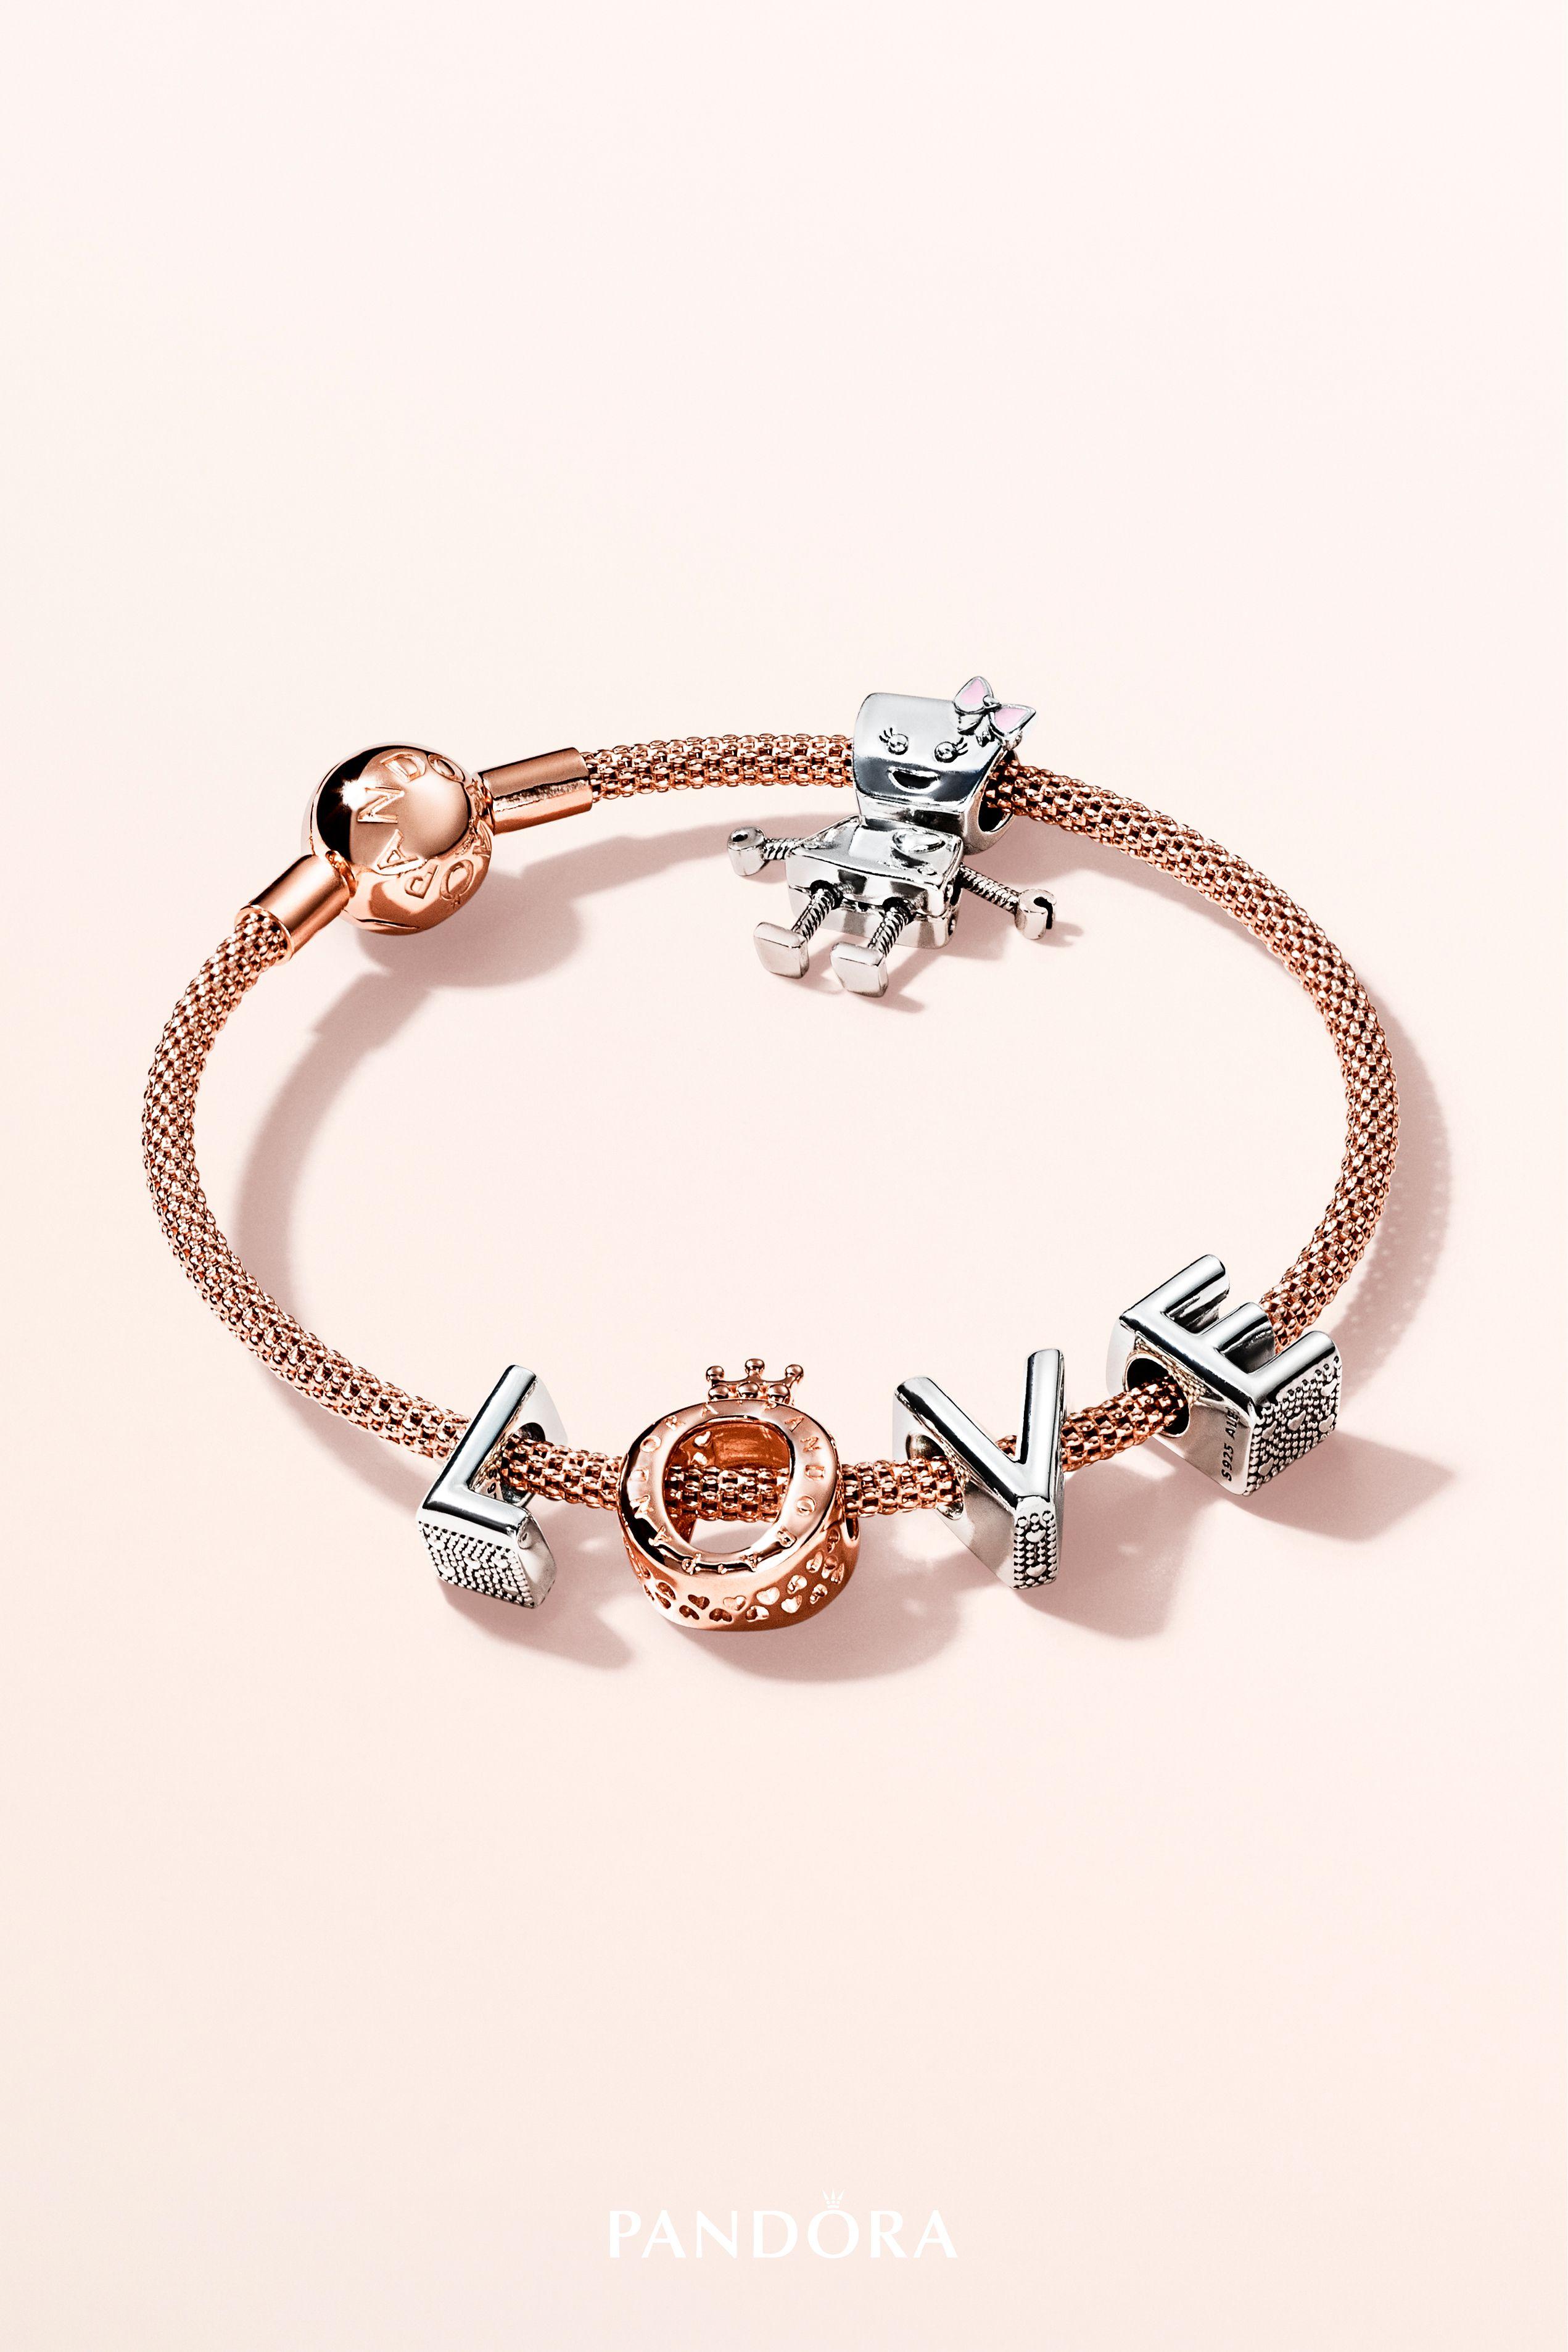 Charms, Bracelets and Rings   Pandora US